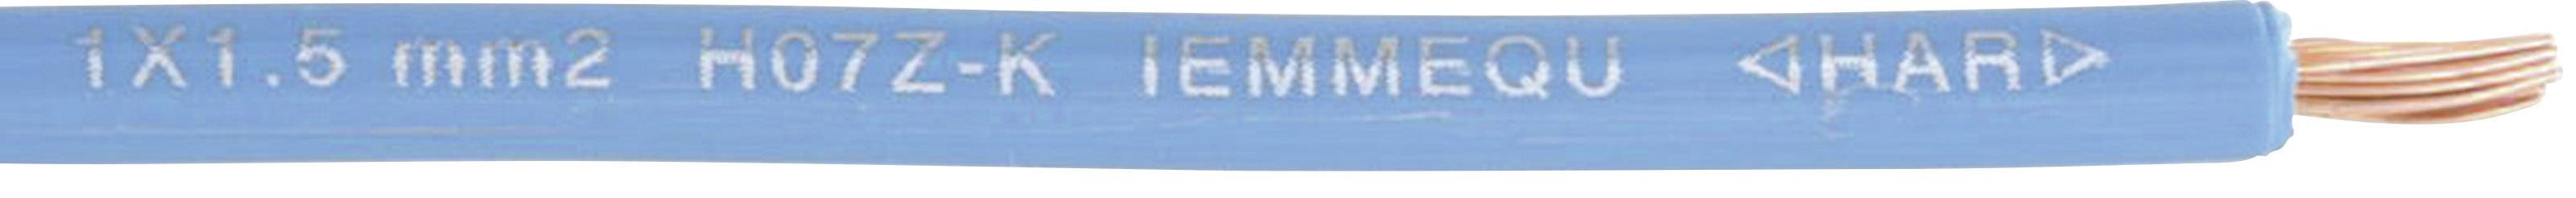 Opletenie / lanko Faber Kabel 040331 H07Z-K, 1 x 4 mm², vonkajší Ø 4.40 mm, 100 m, tmavomodrá